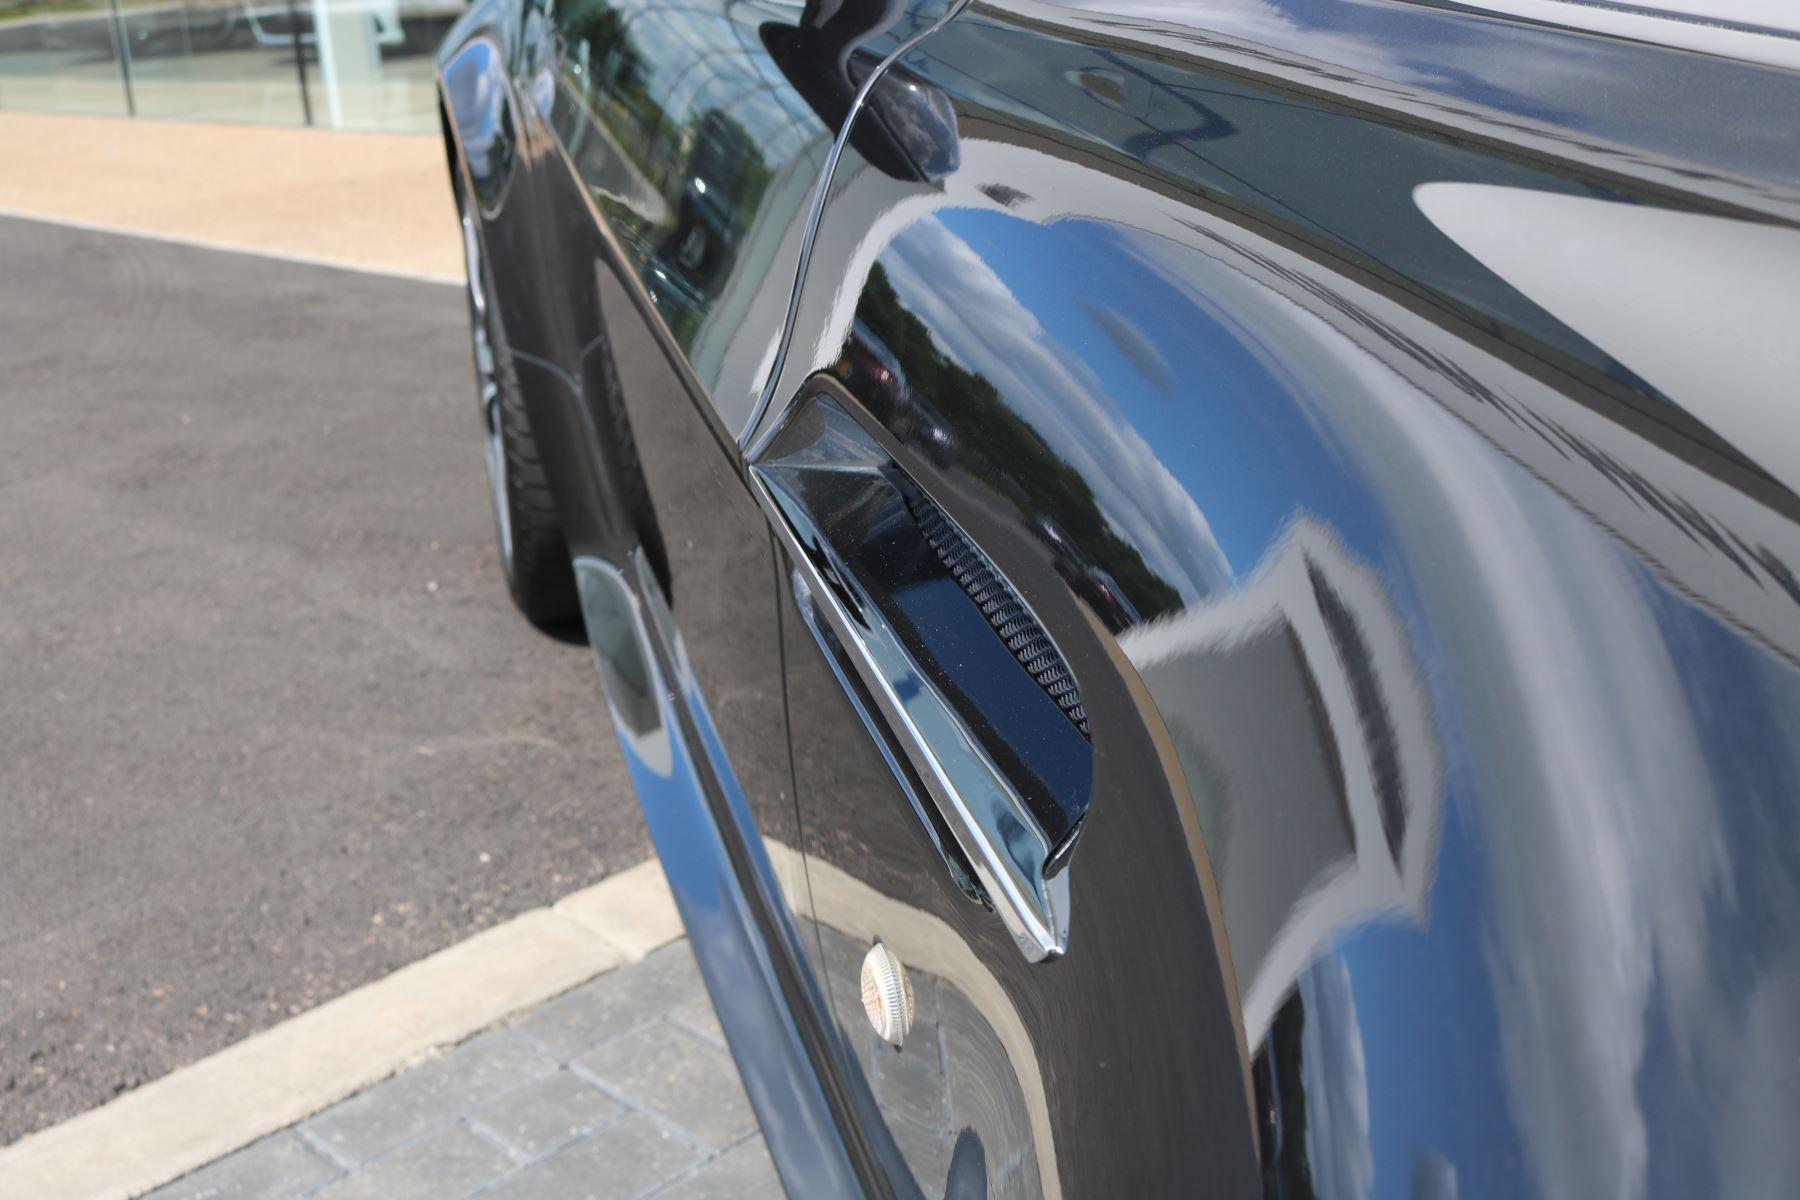 Aston Martin V12 Vantage 2dr image 10